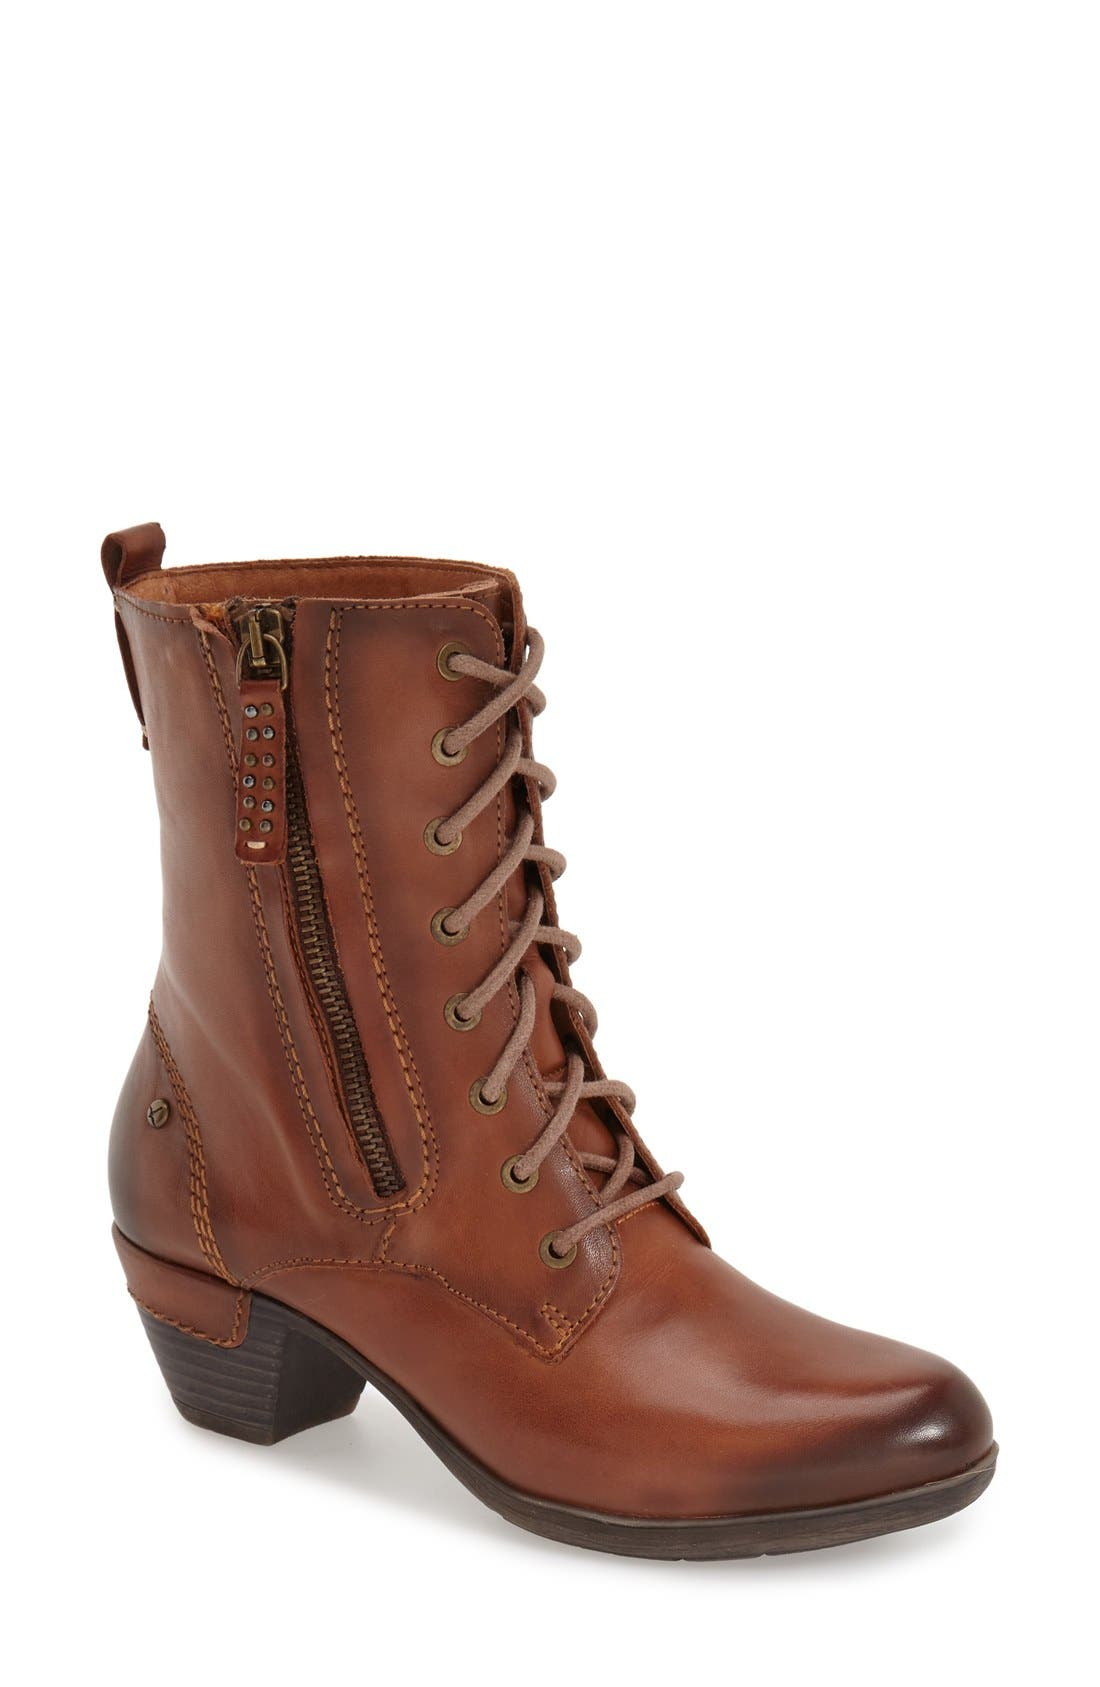 Alternate Image 1 Selected - PIKOLINOS 'Rotterdam' Lace-Up Boot (Women)